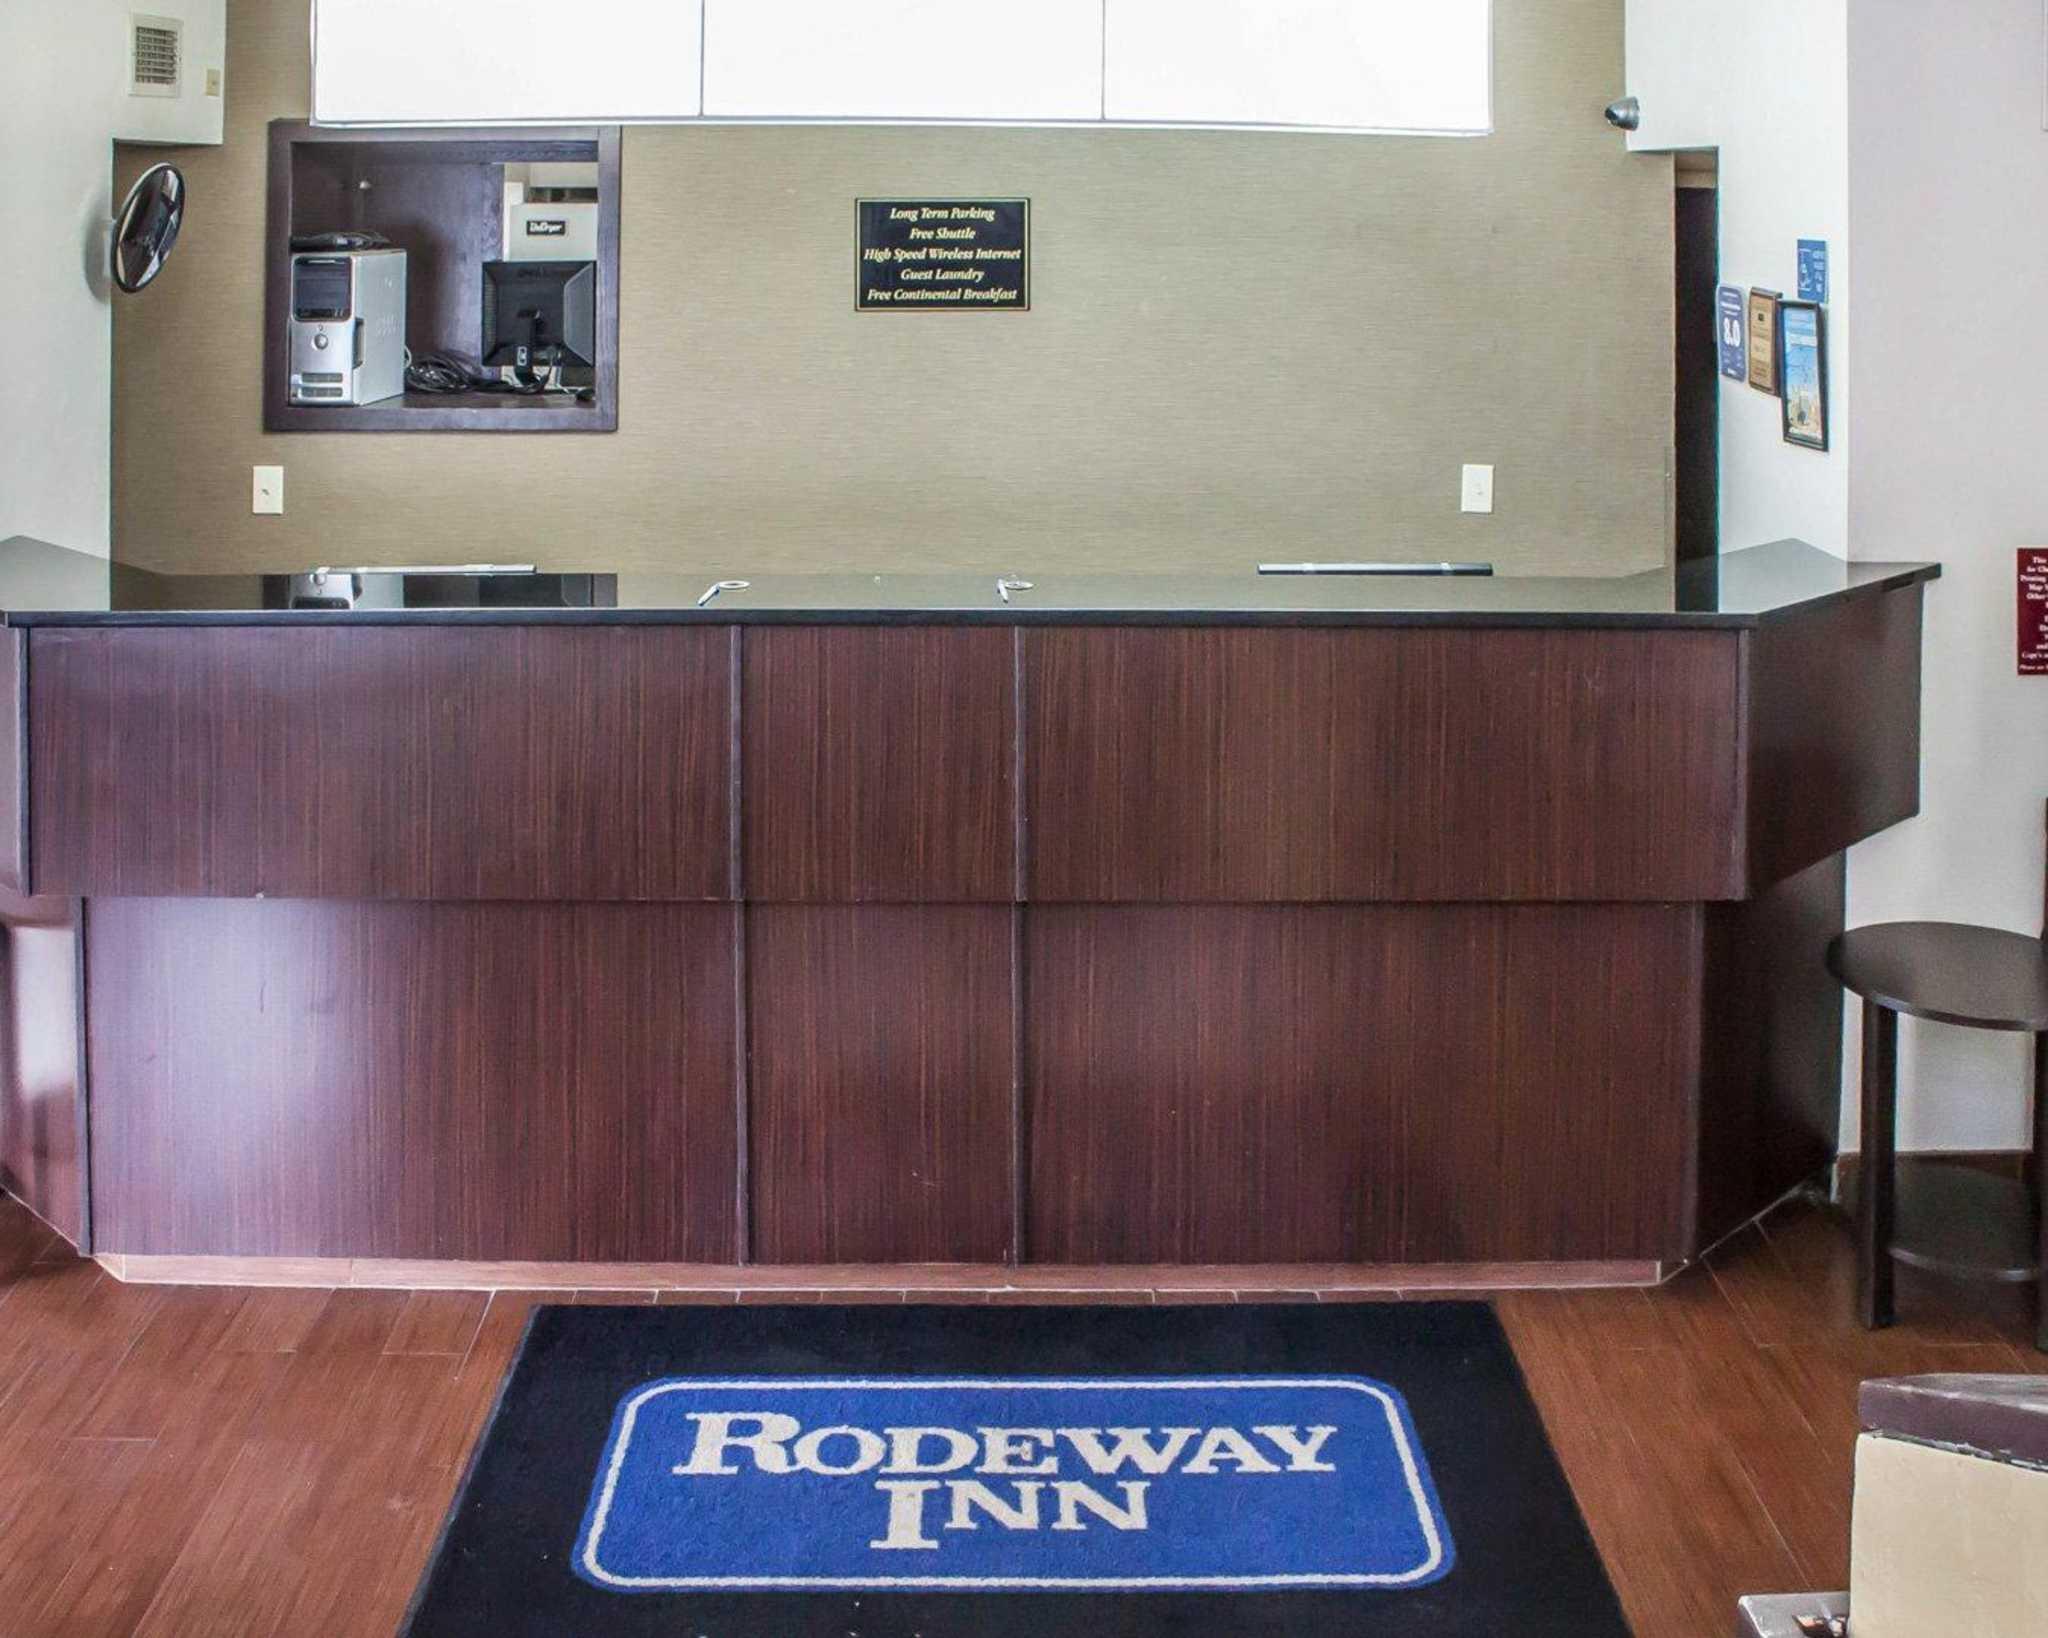 Rodeway Inn Airport image 24